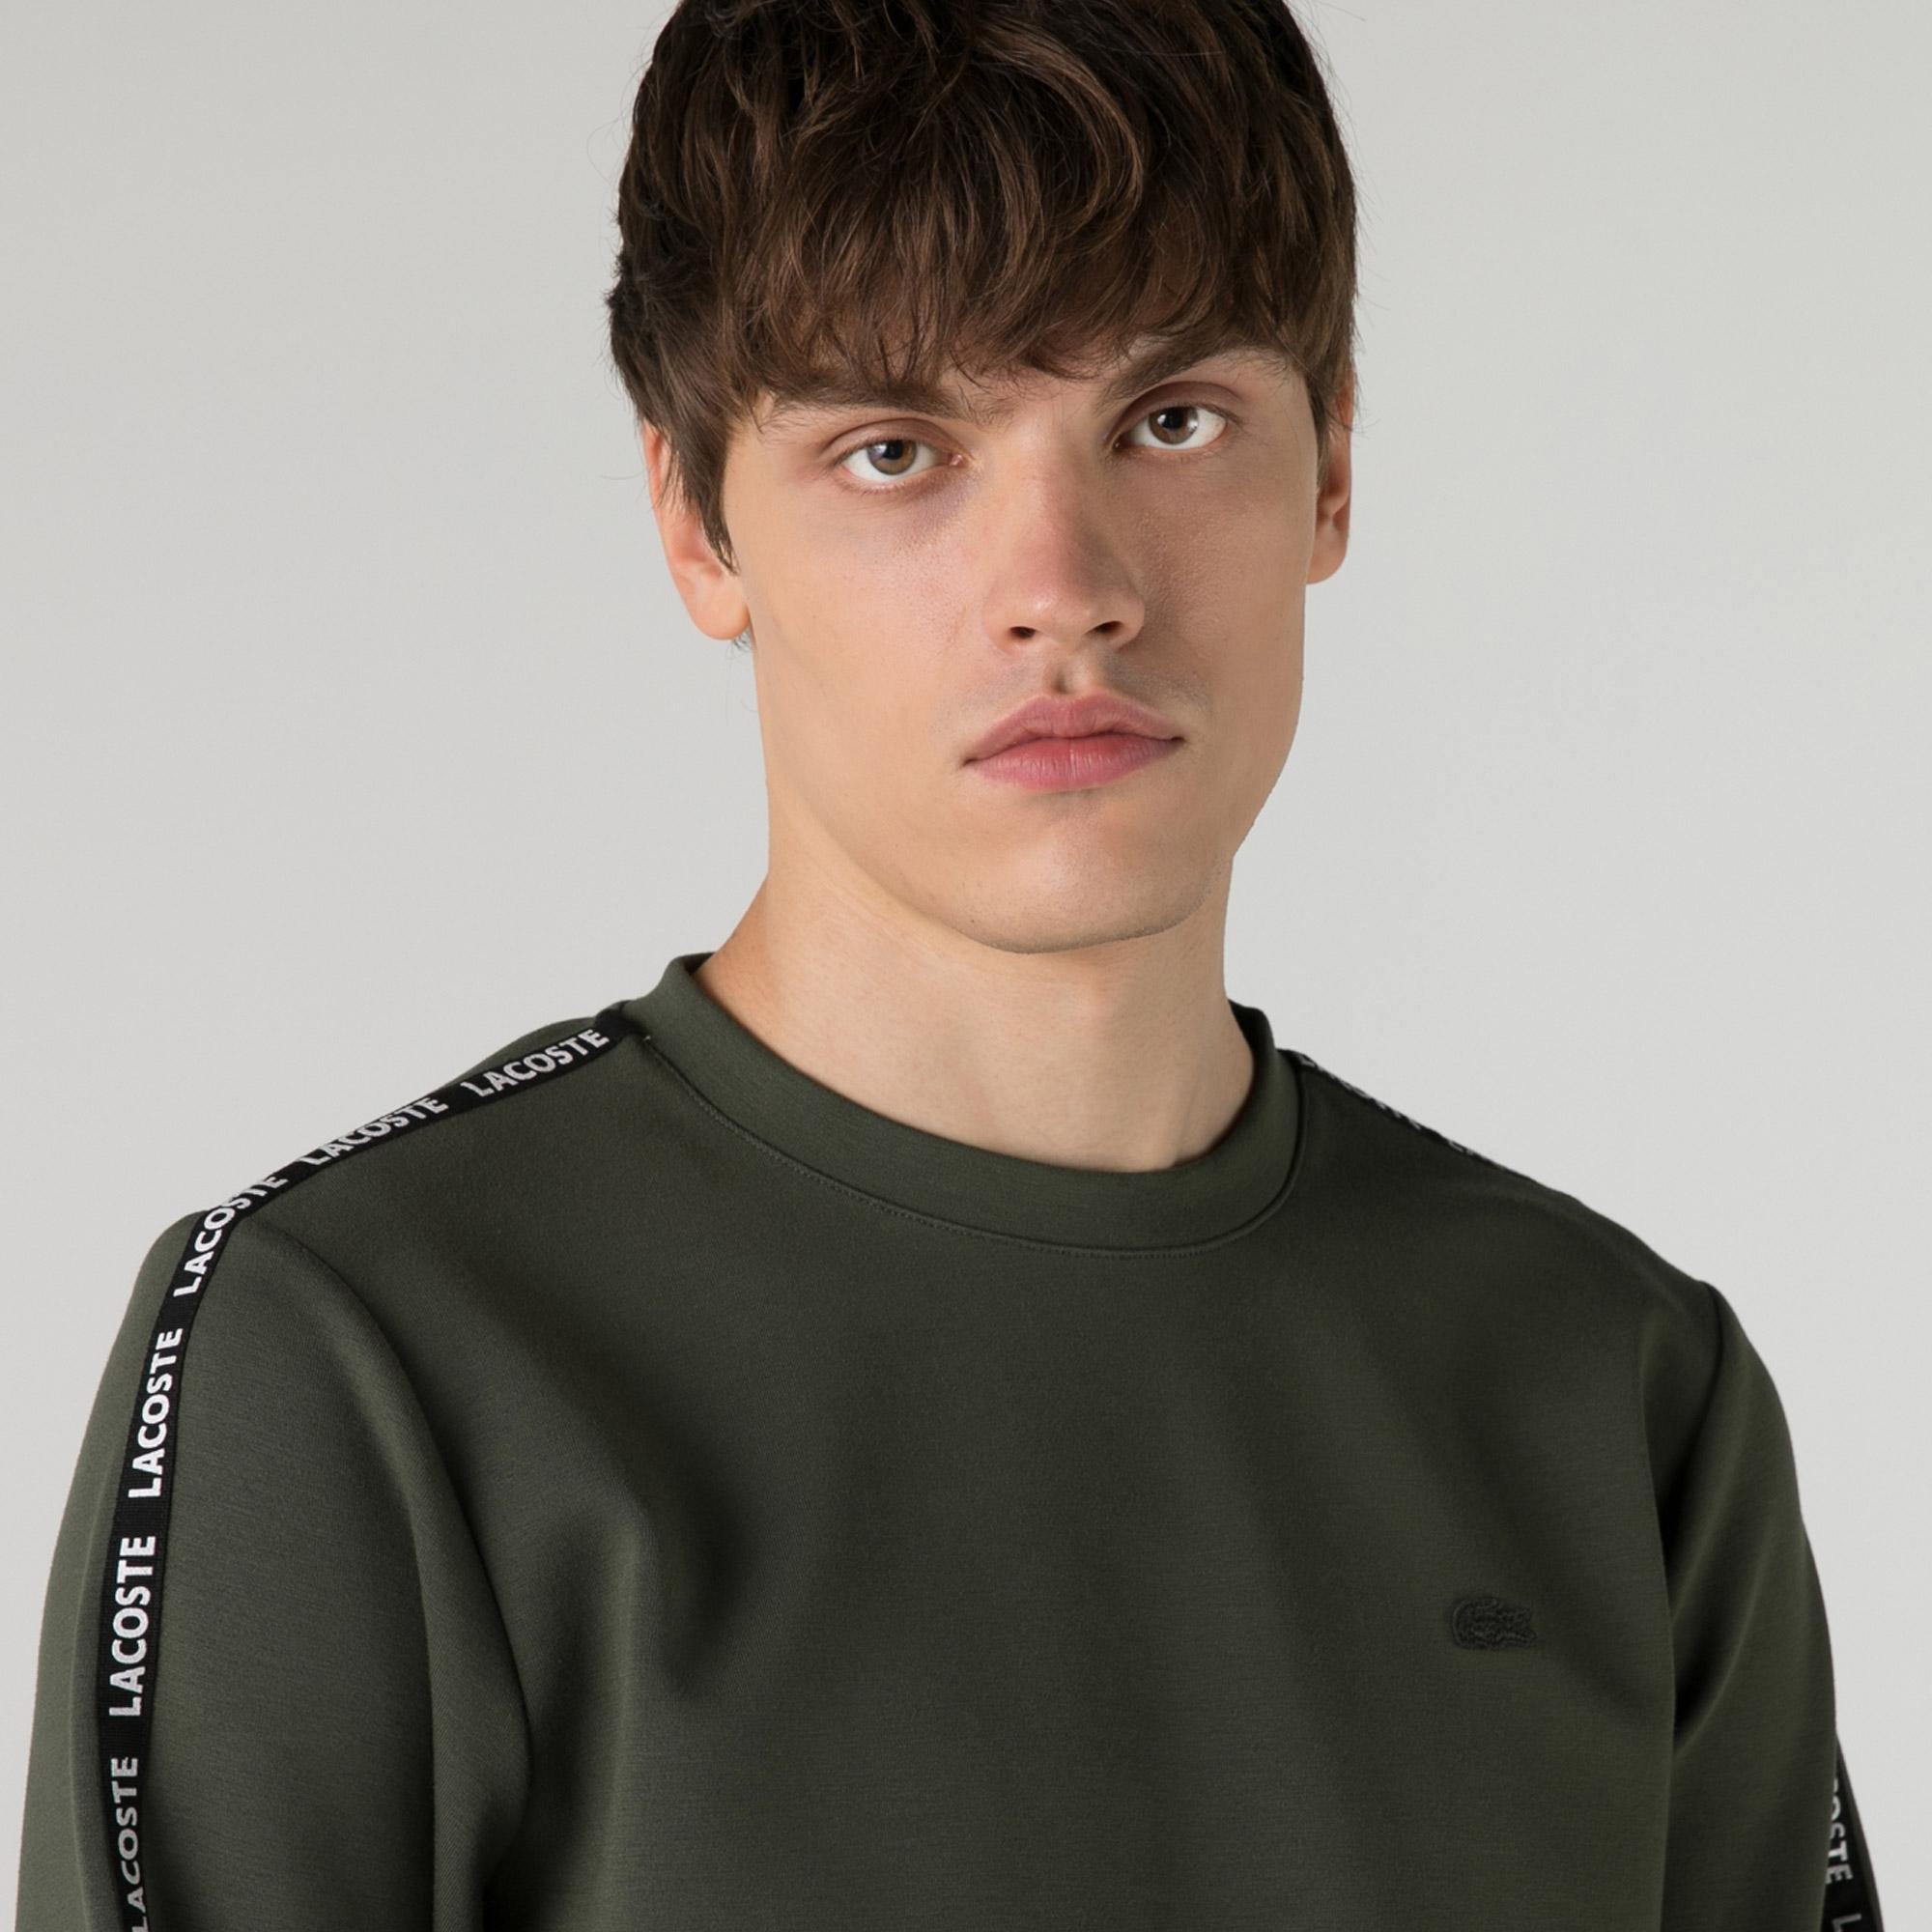 Lacoste Erkek Slim Fit Bisiklet Yaka Haki Sweatshirt